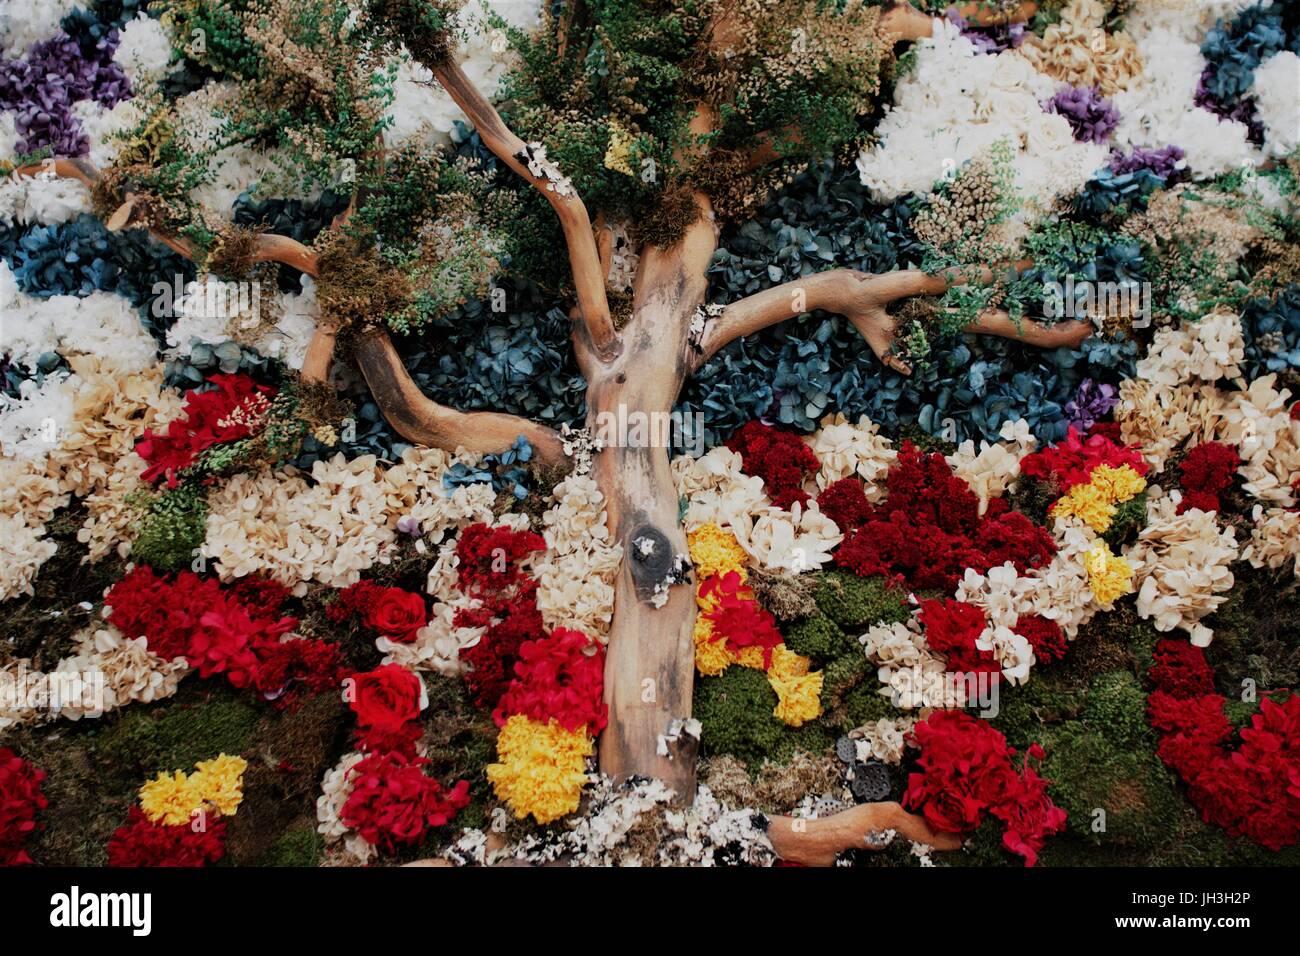 An Exhibit at the Bellagio casino flower garden in Las Vegas - Stock Image